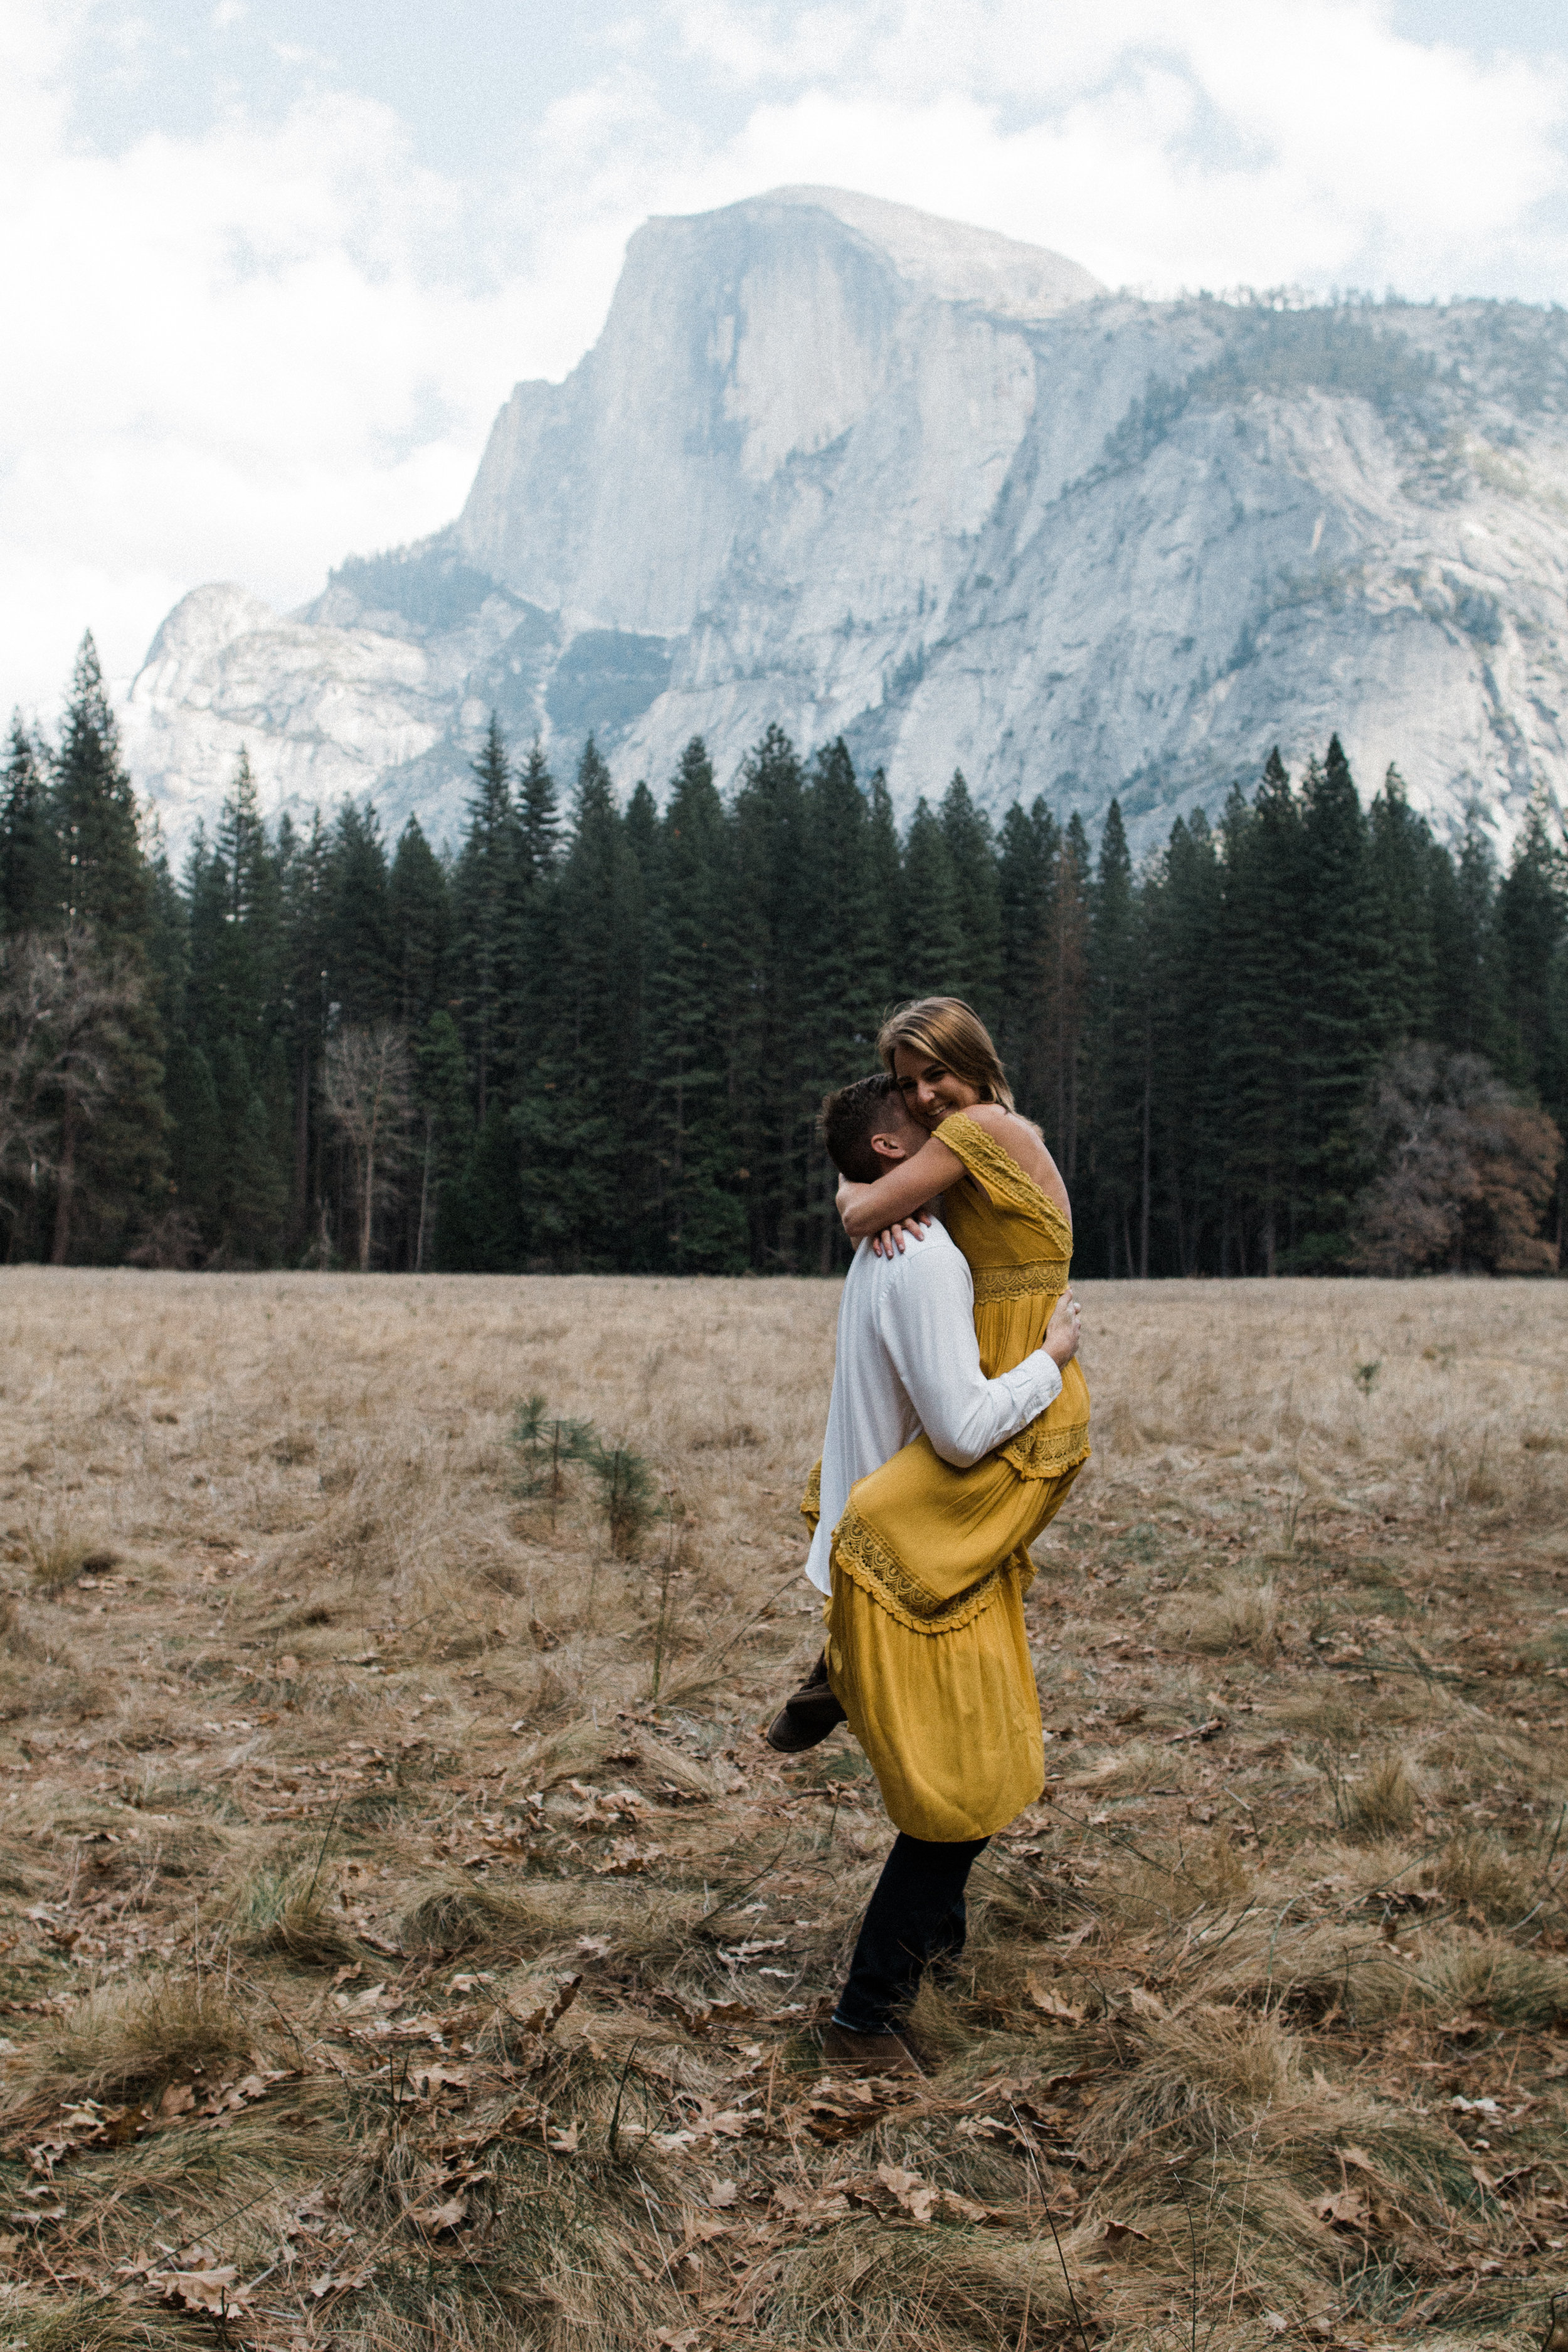 Adventure elopement photography giveaway!